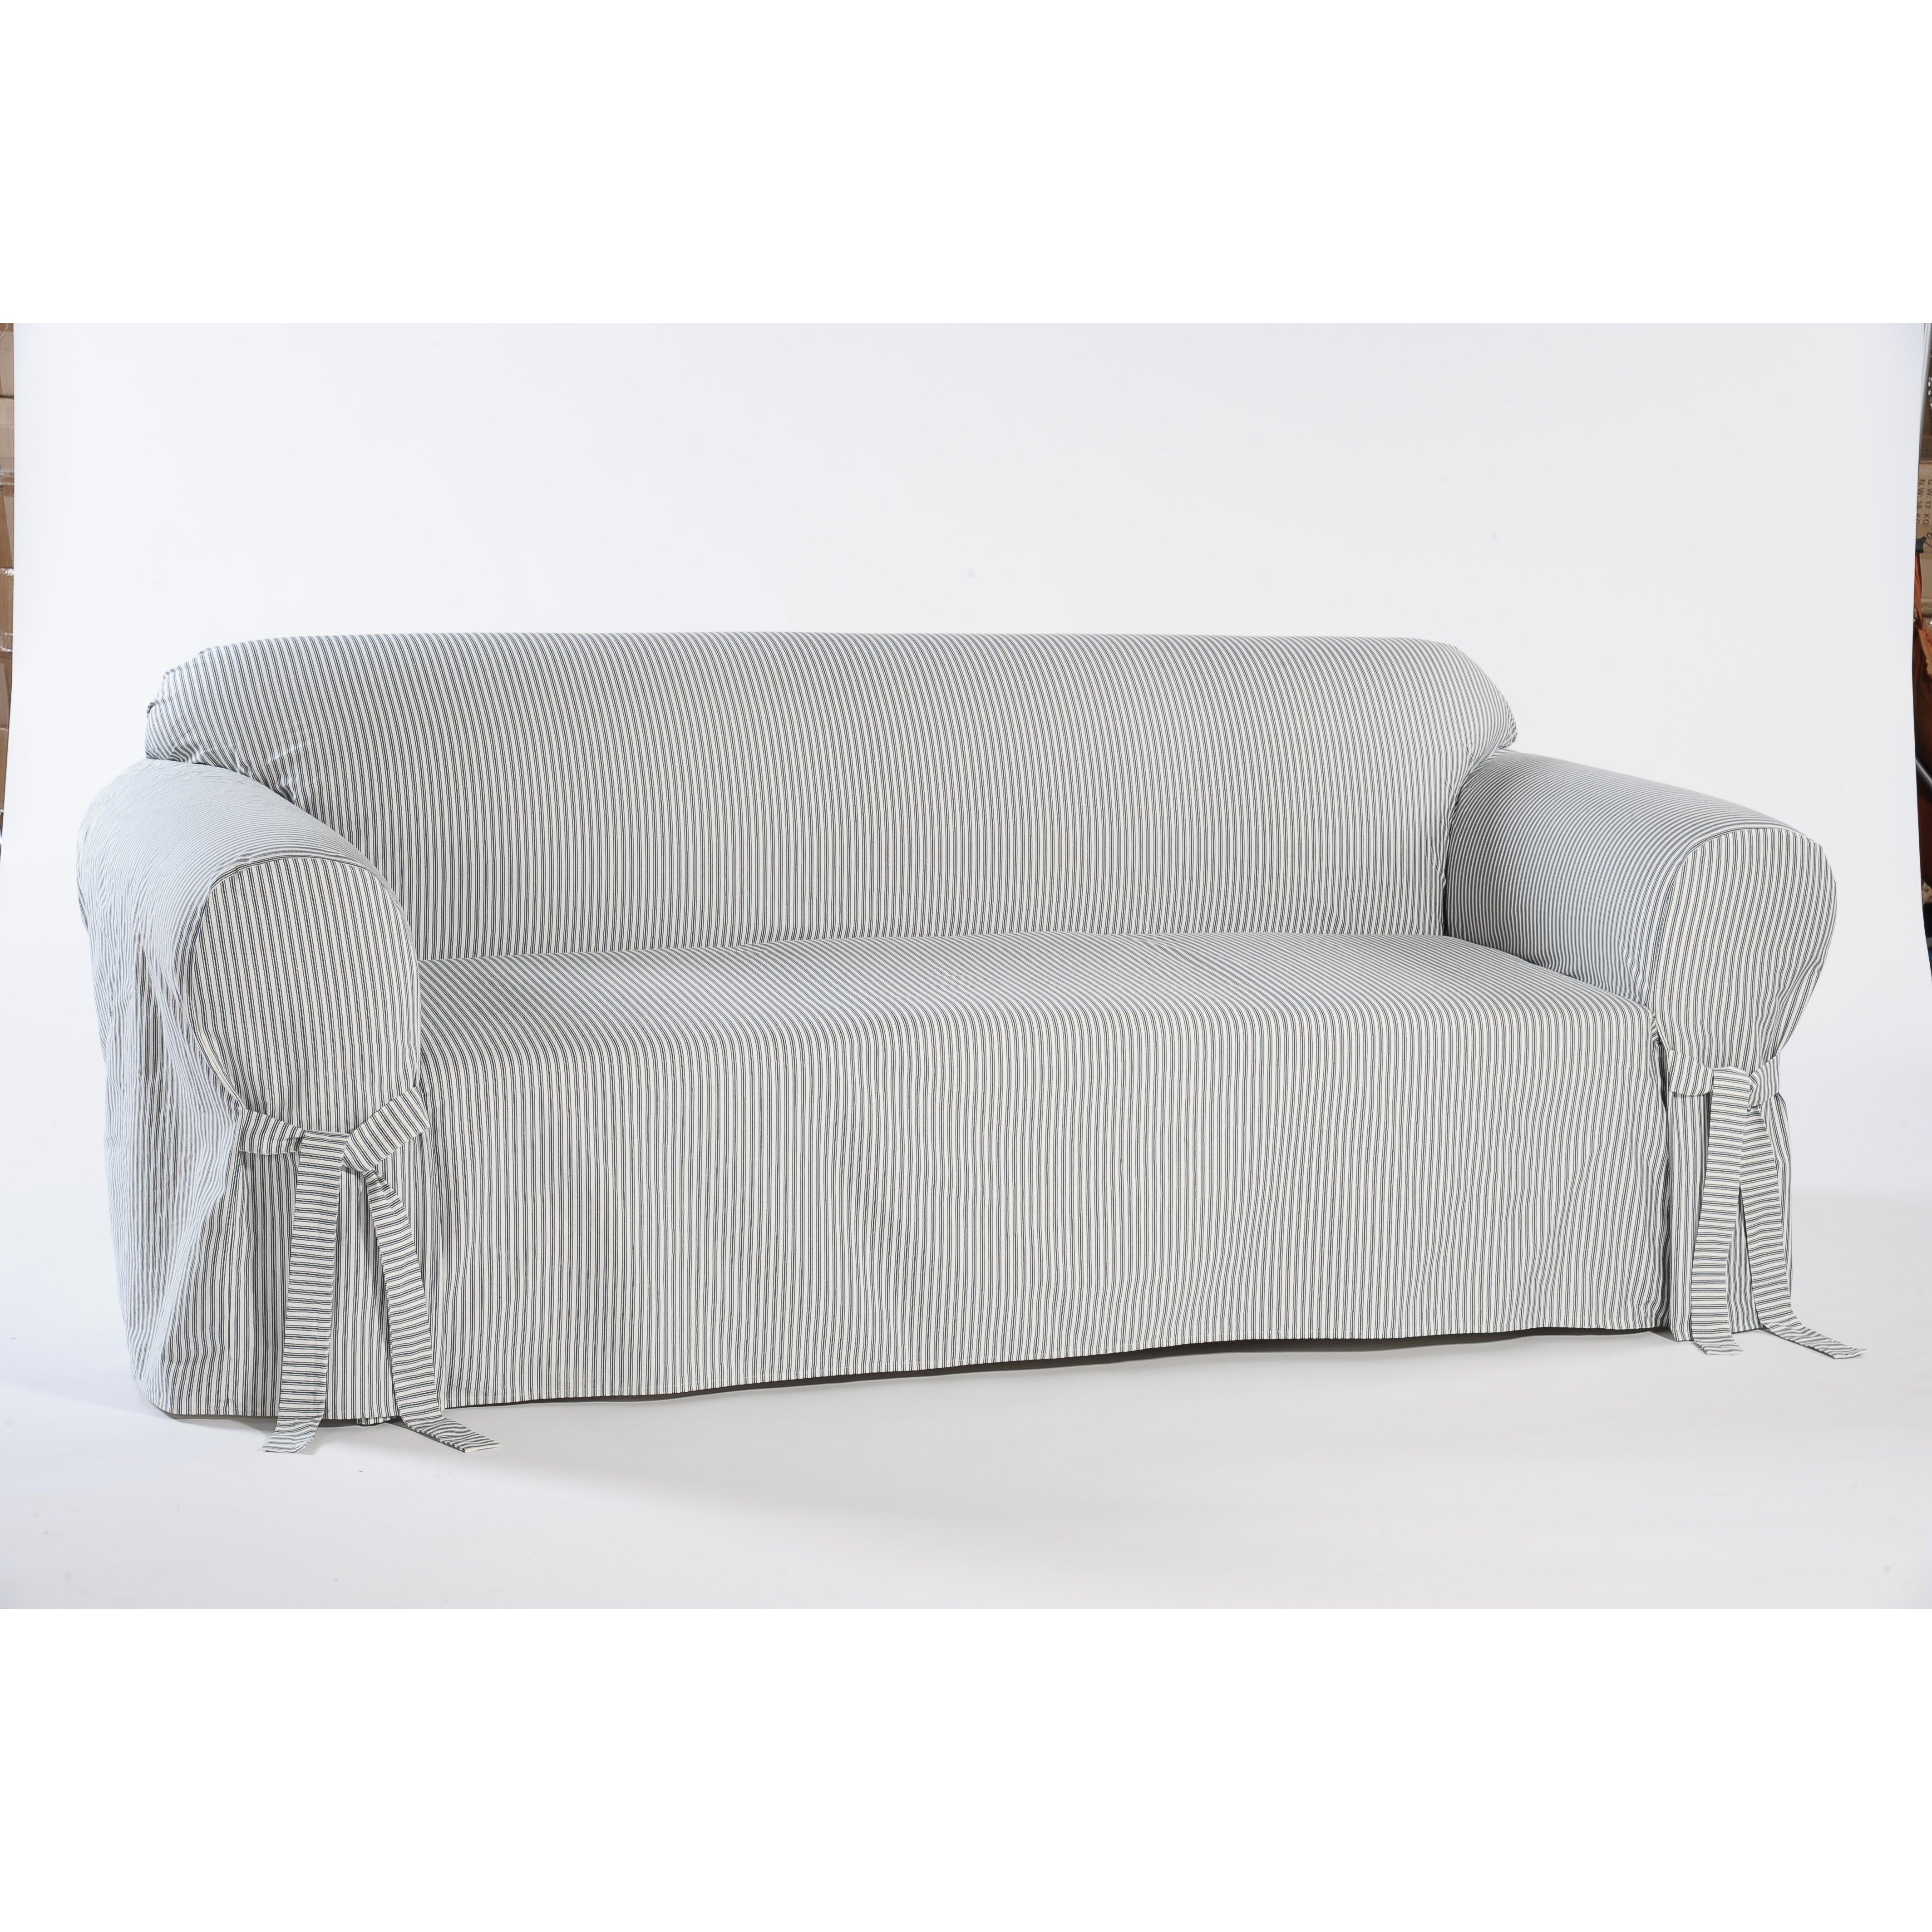 Sofa Slipcover: Stripe Twill Sofa Slipcover